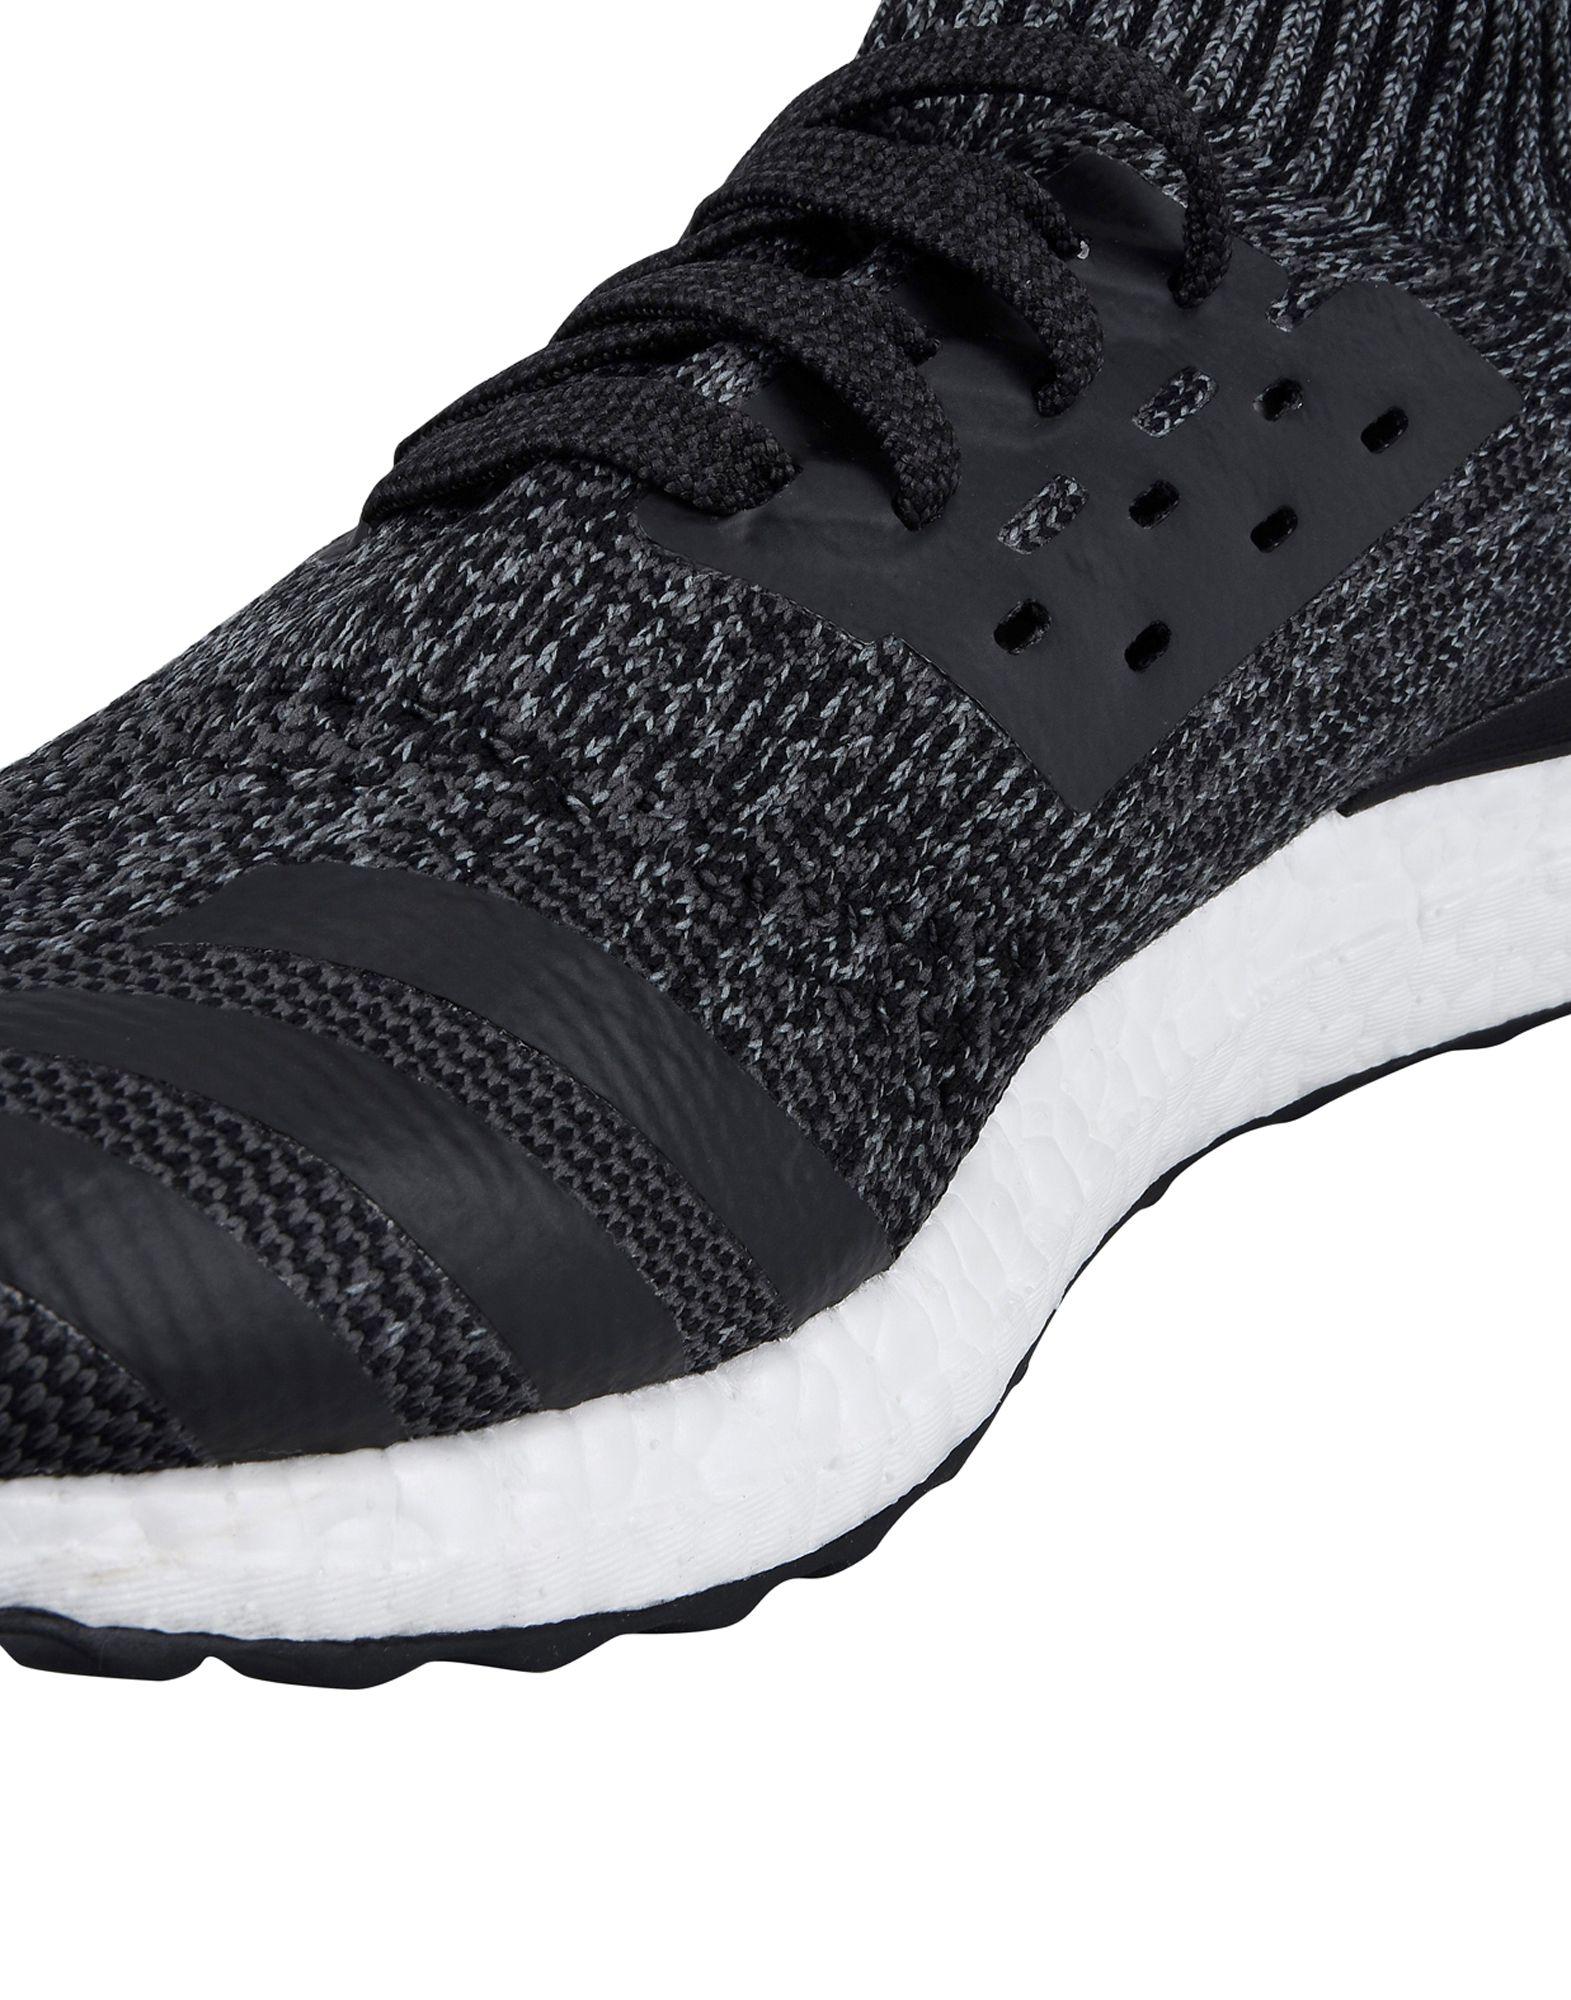 Adidas Ultraboost Uncaged  11307163XH Gute Qualität beliebte Schuhe